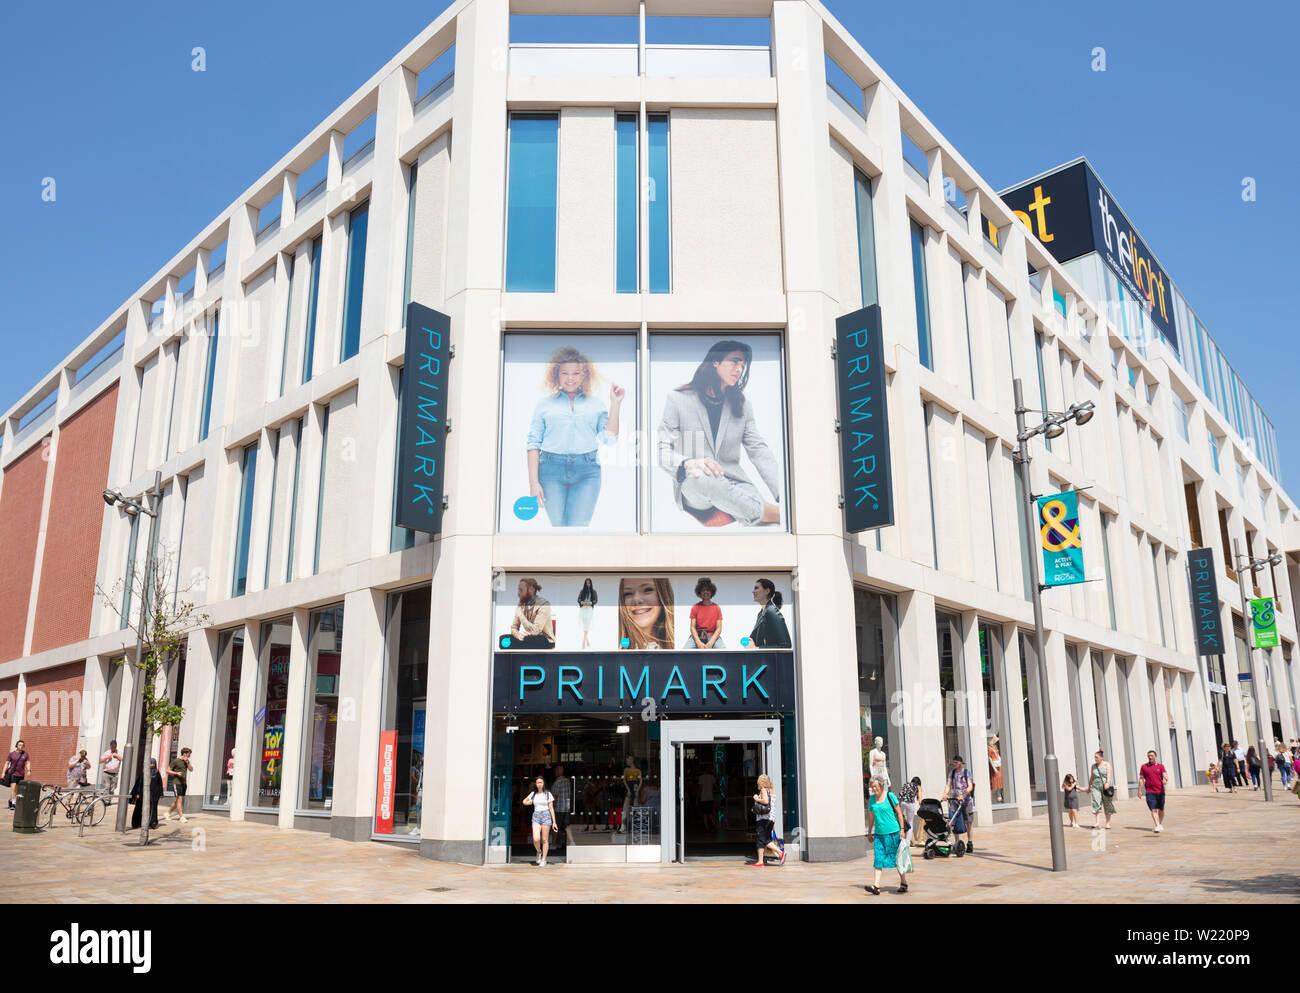 Primark primark store boutique,le centre-ville de Sheffield Sheffield South Yorkshire Angleterre uk go Europe Photo Stock